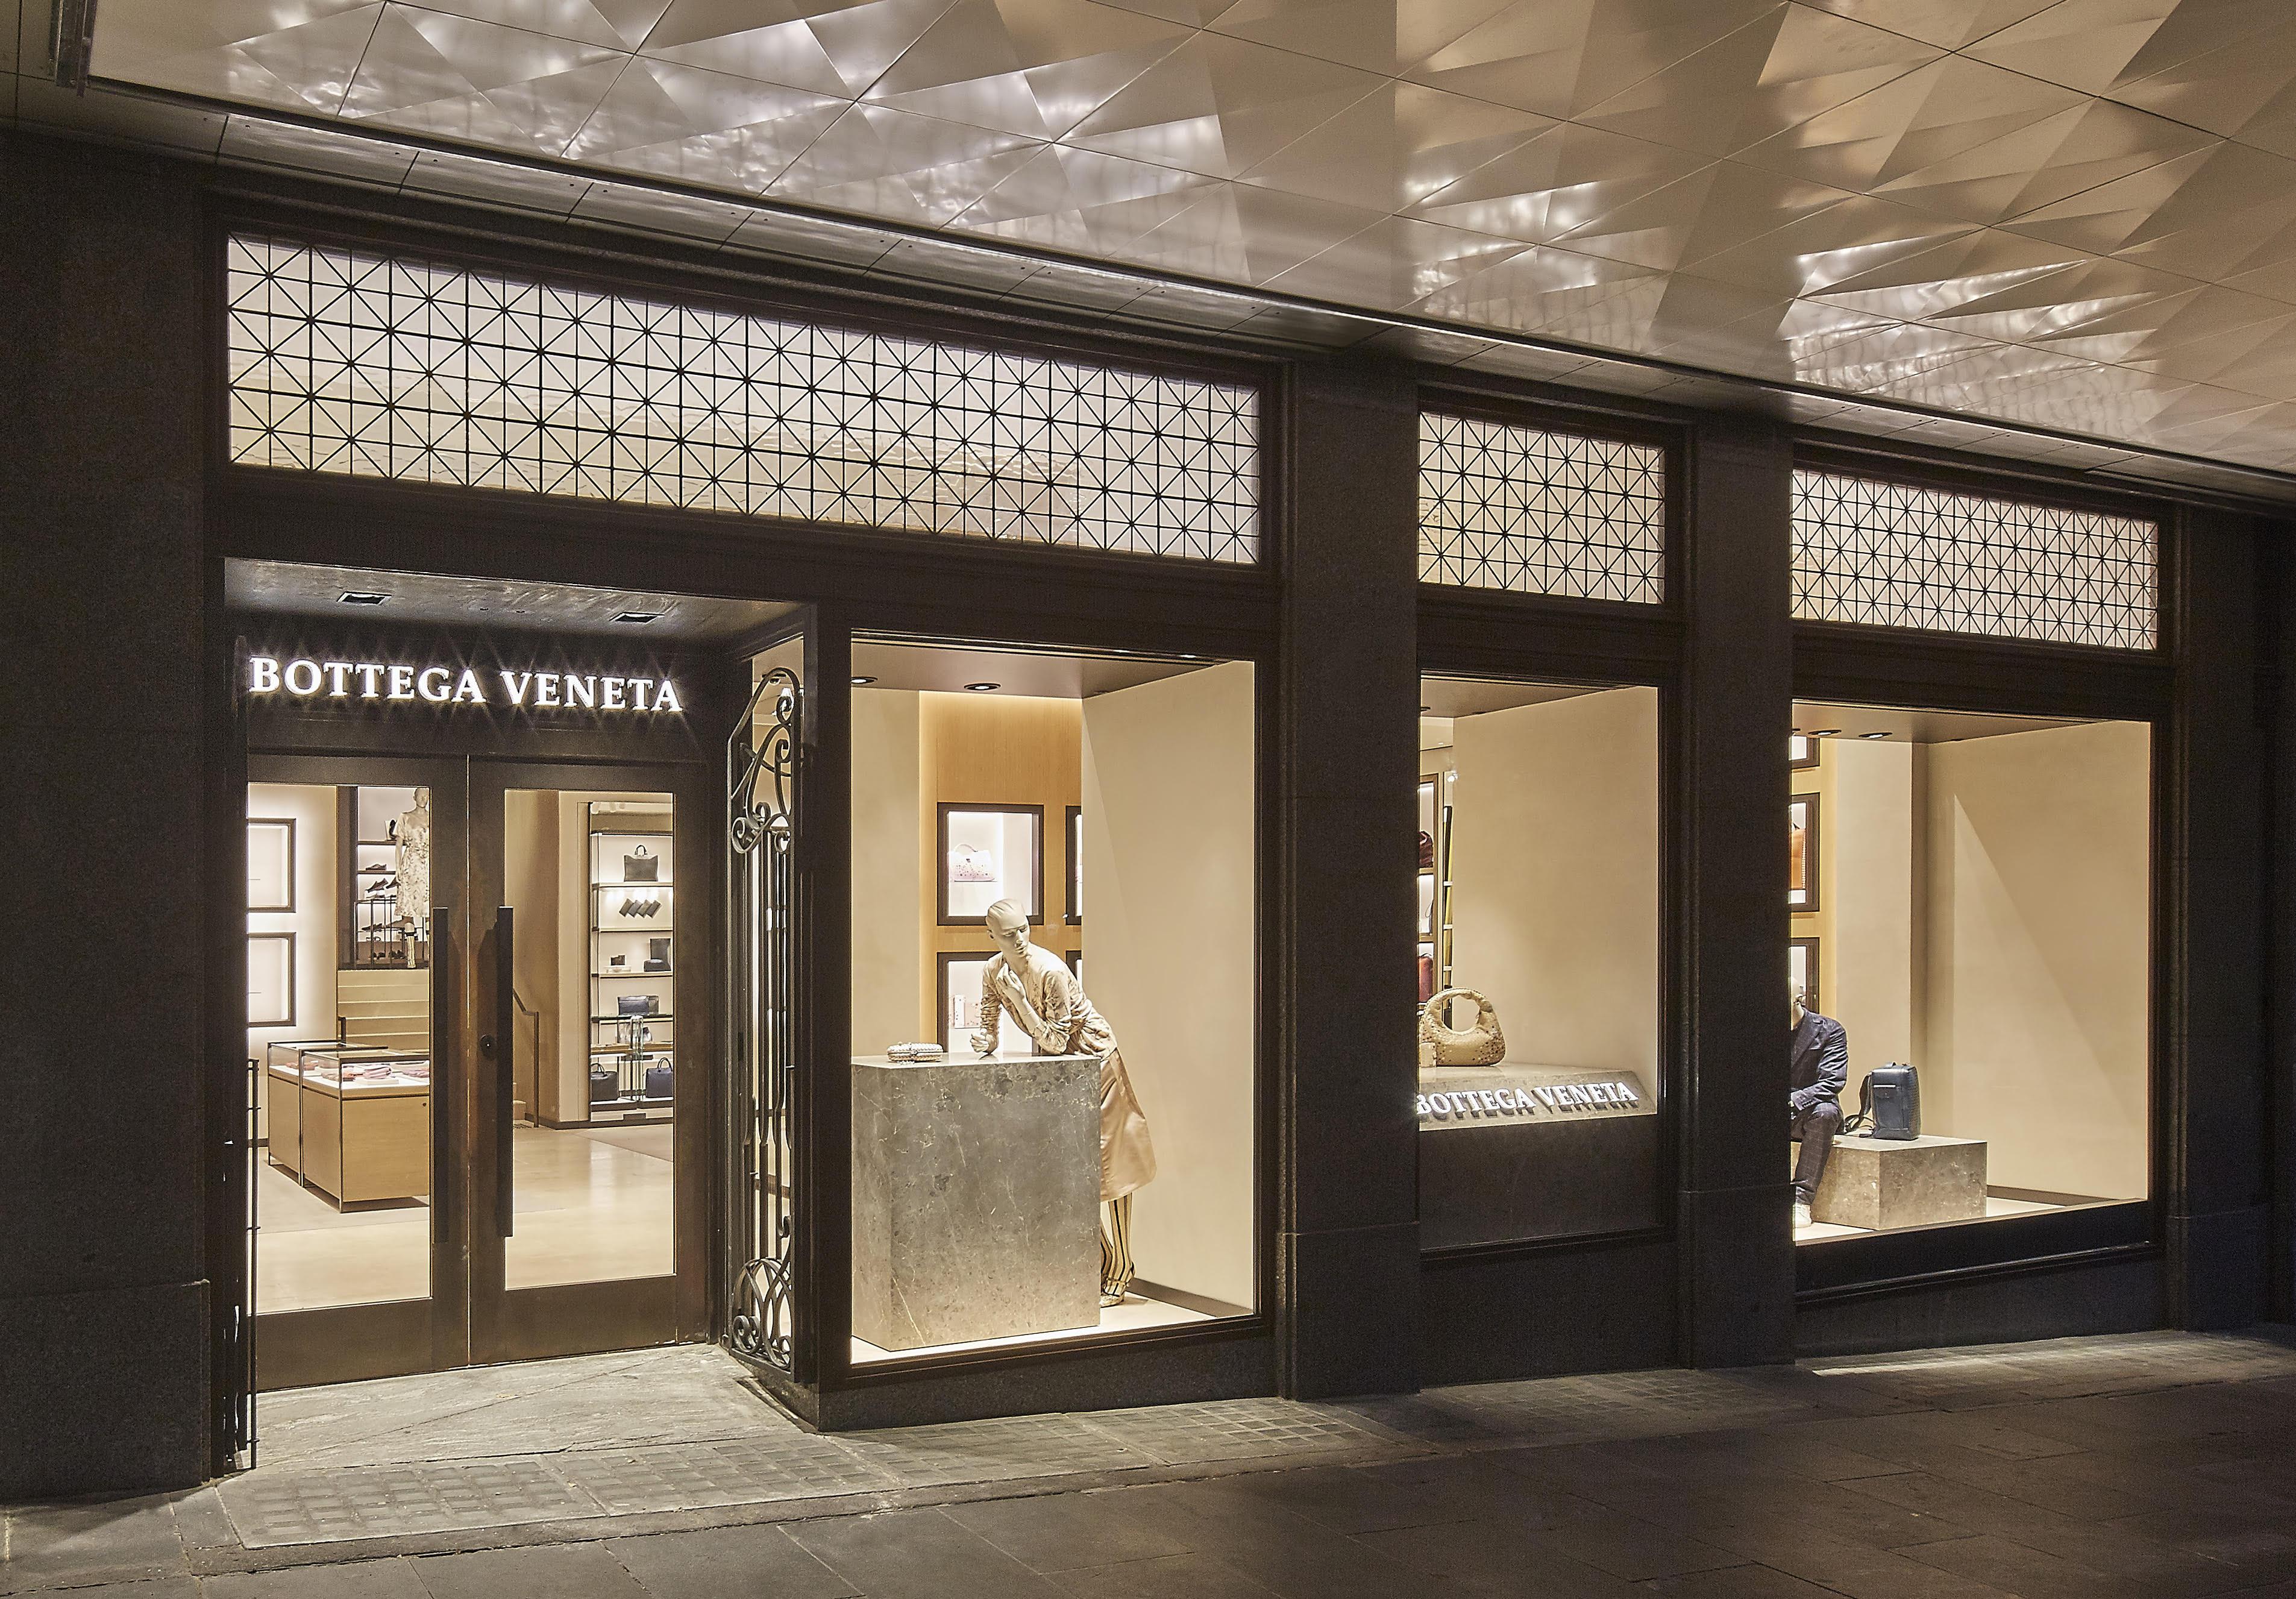 Bottega Veneta opening its first Australian flagship store in the heritage building.